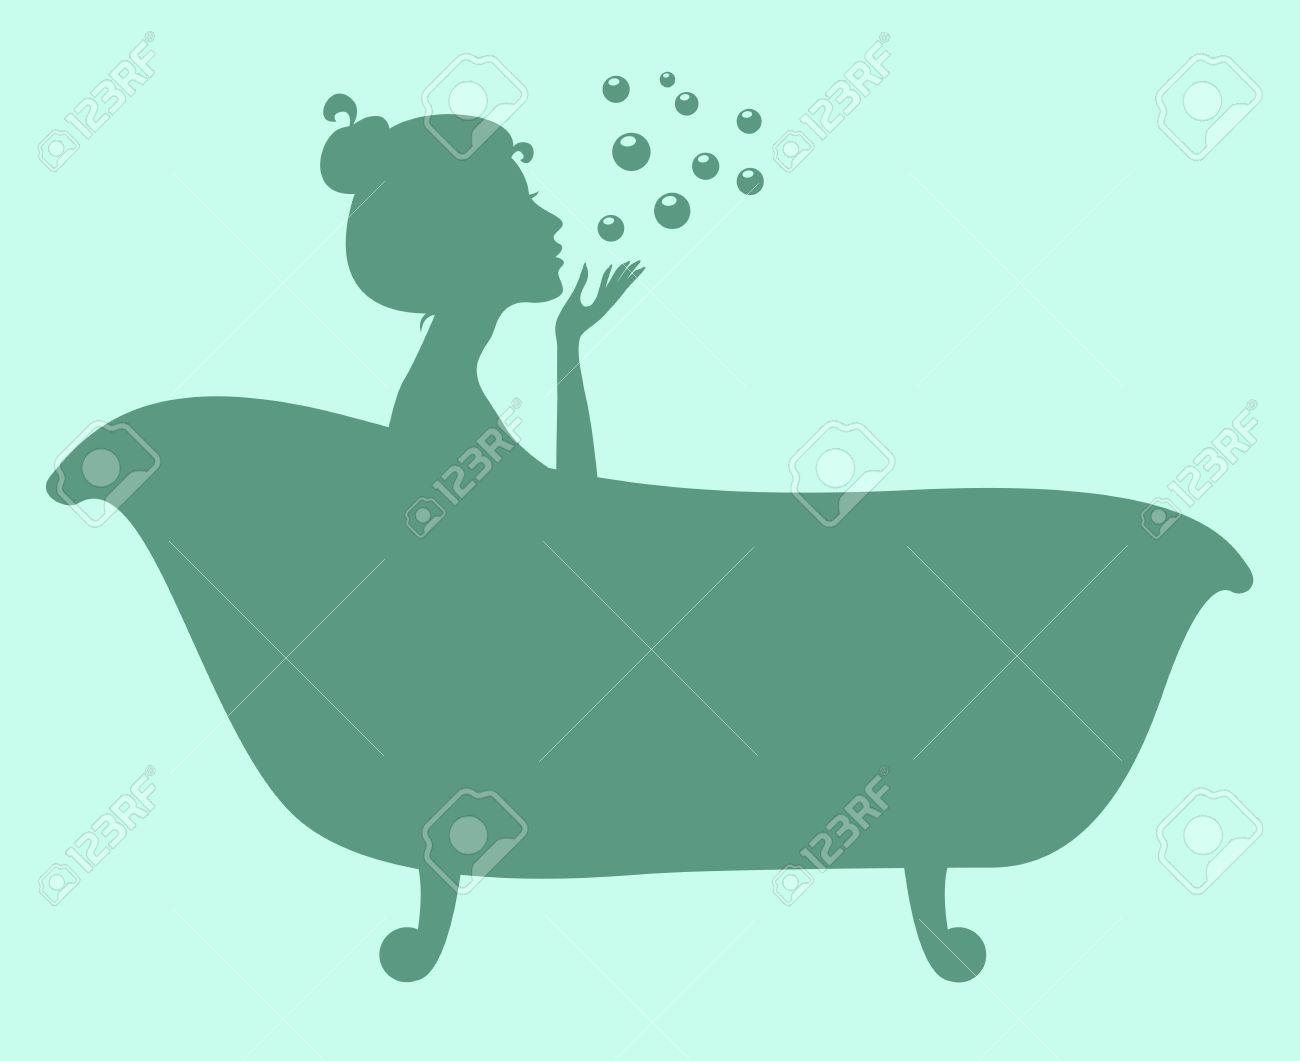 Woman in bathtub. Silhouette - 56939660